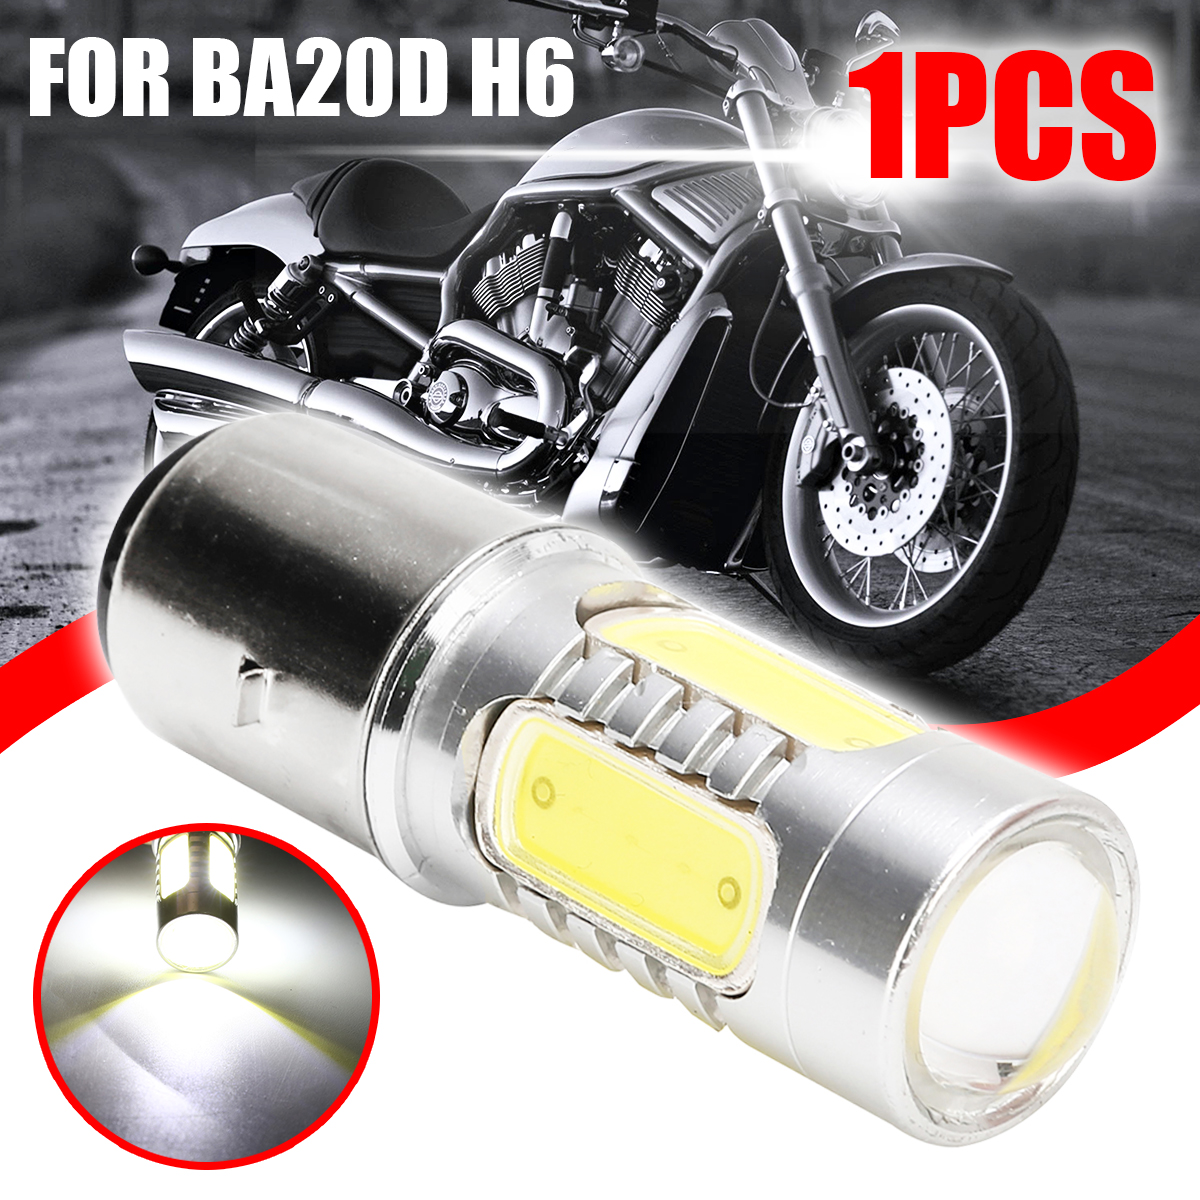 Treyues 1 Pc BA20D H6 Motorcycle Headlight DC12V 4COB LED Light Bulb White For Moped Scooter ATV